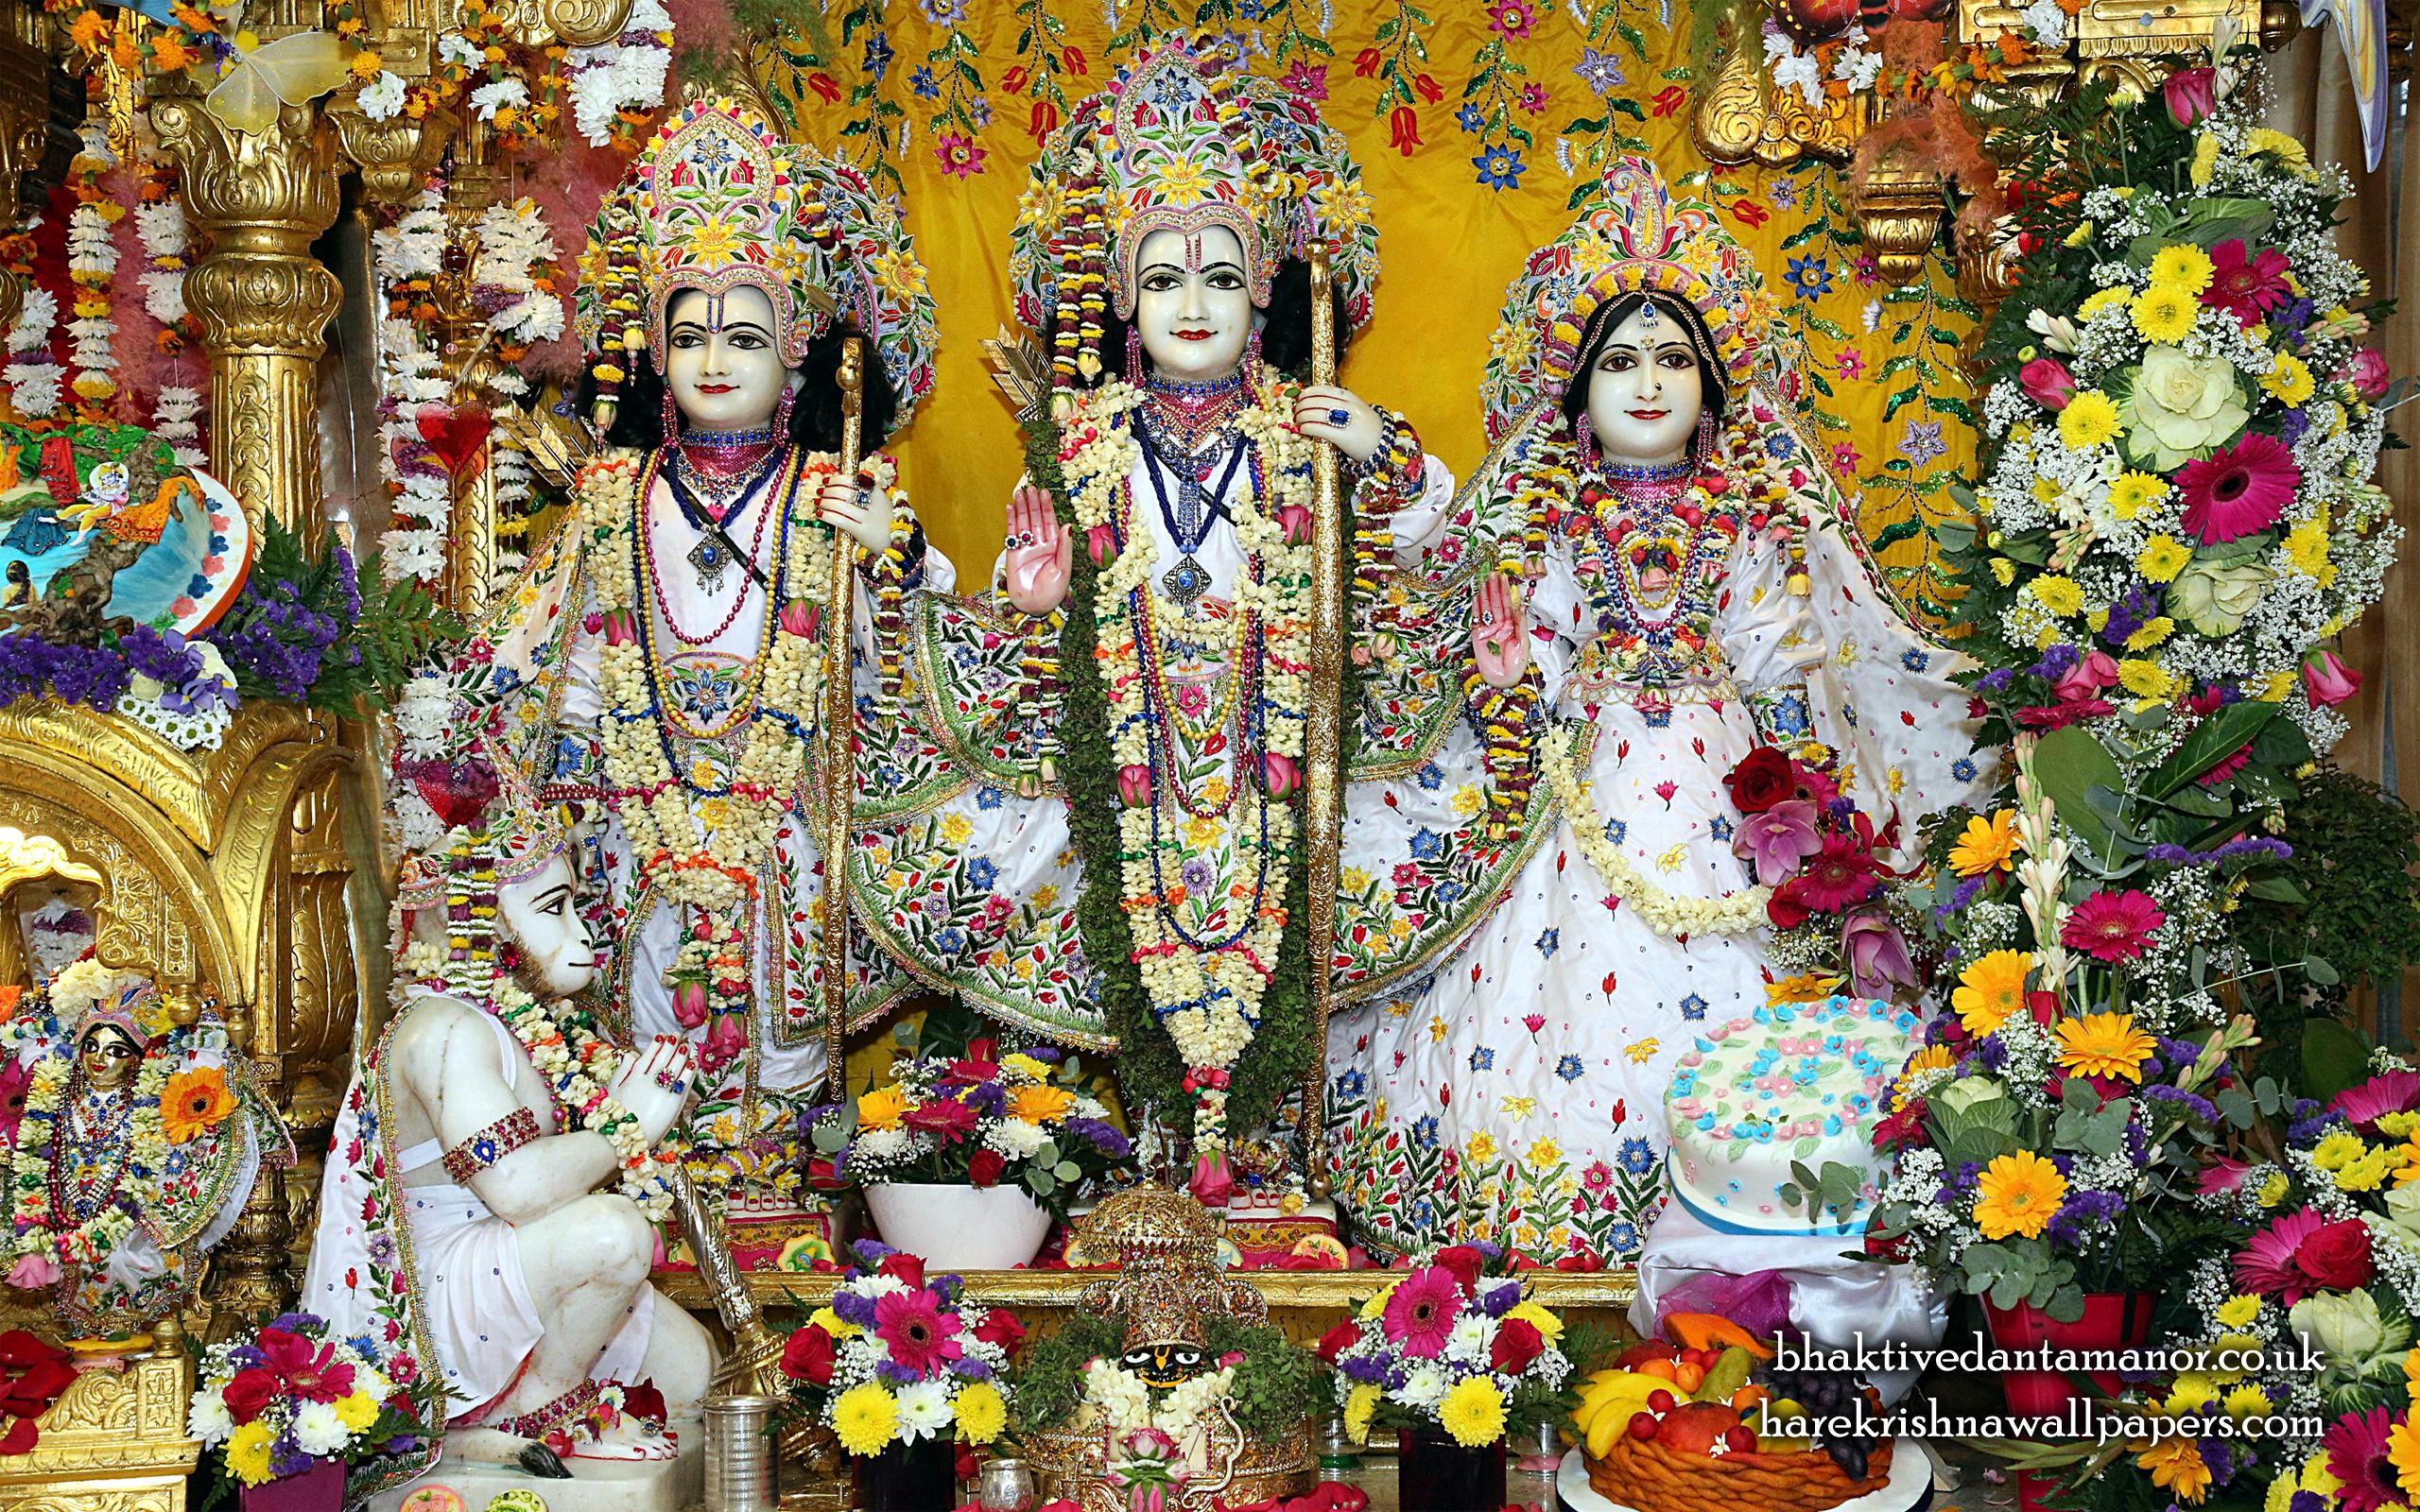 Sri Sri Sita Rama Laxman Hanuman Wallpaper (014) Size 2560x1600 Download